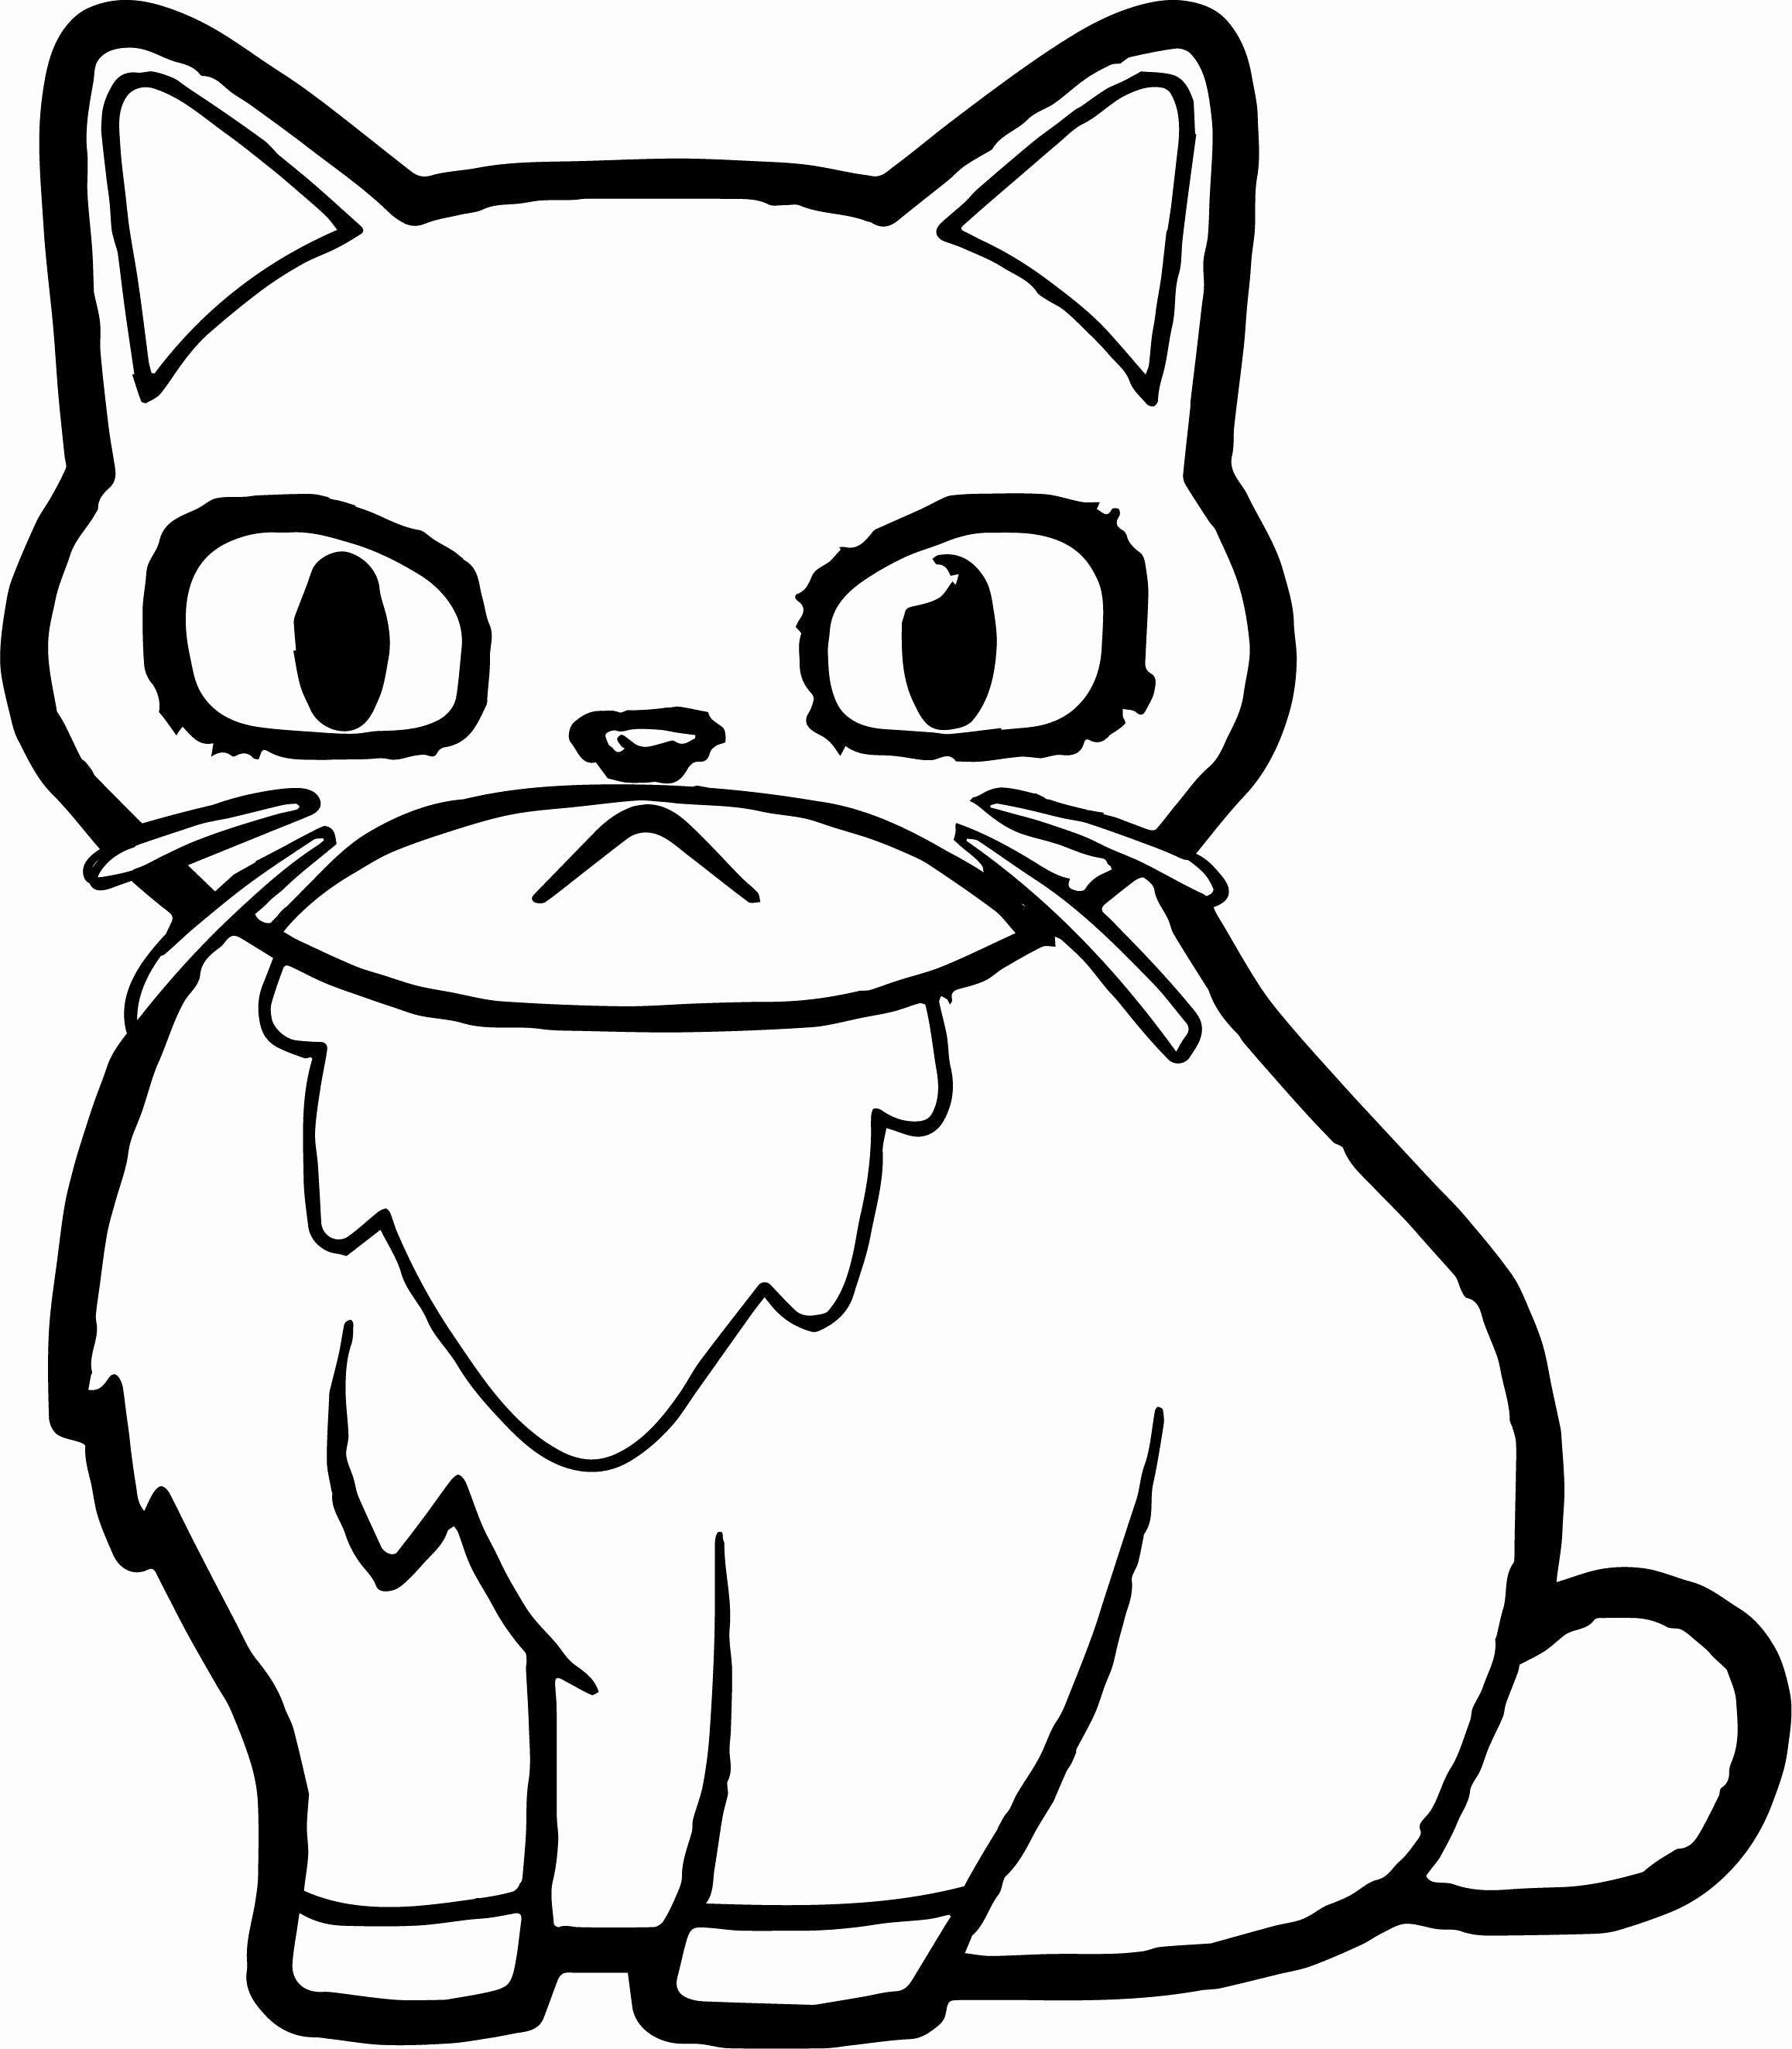 Grumpy Cat Coloring Book Inspirational Grumpy Cat Coloring Pages At Getcolorings Cat Coloring Book Cartoon Coloring Pages Cat Coloring Page